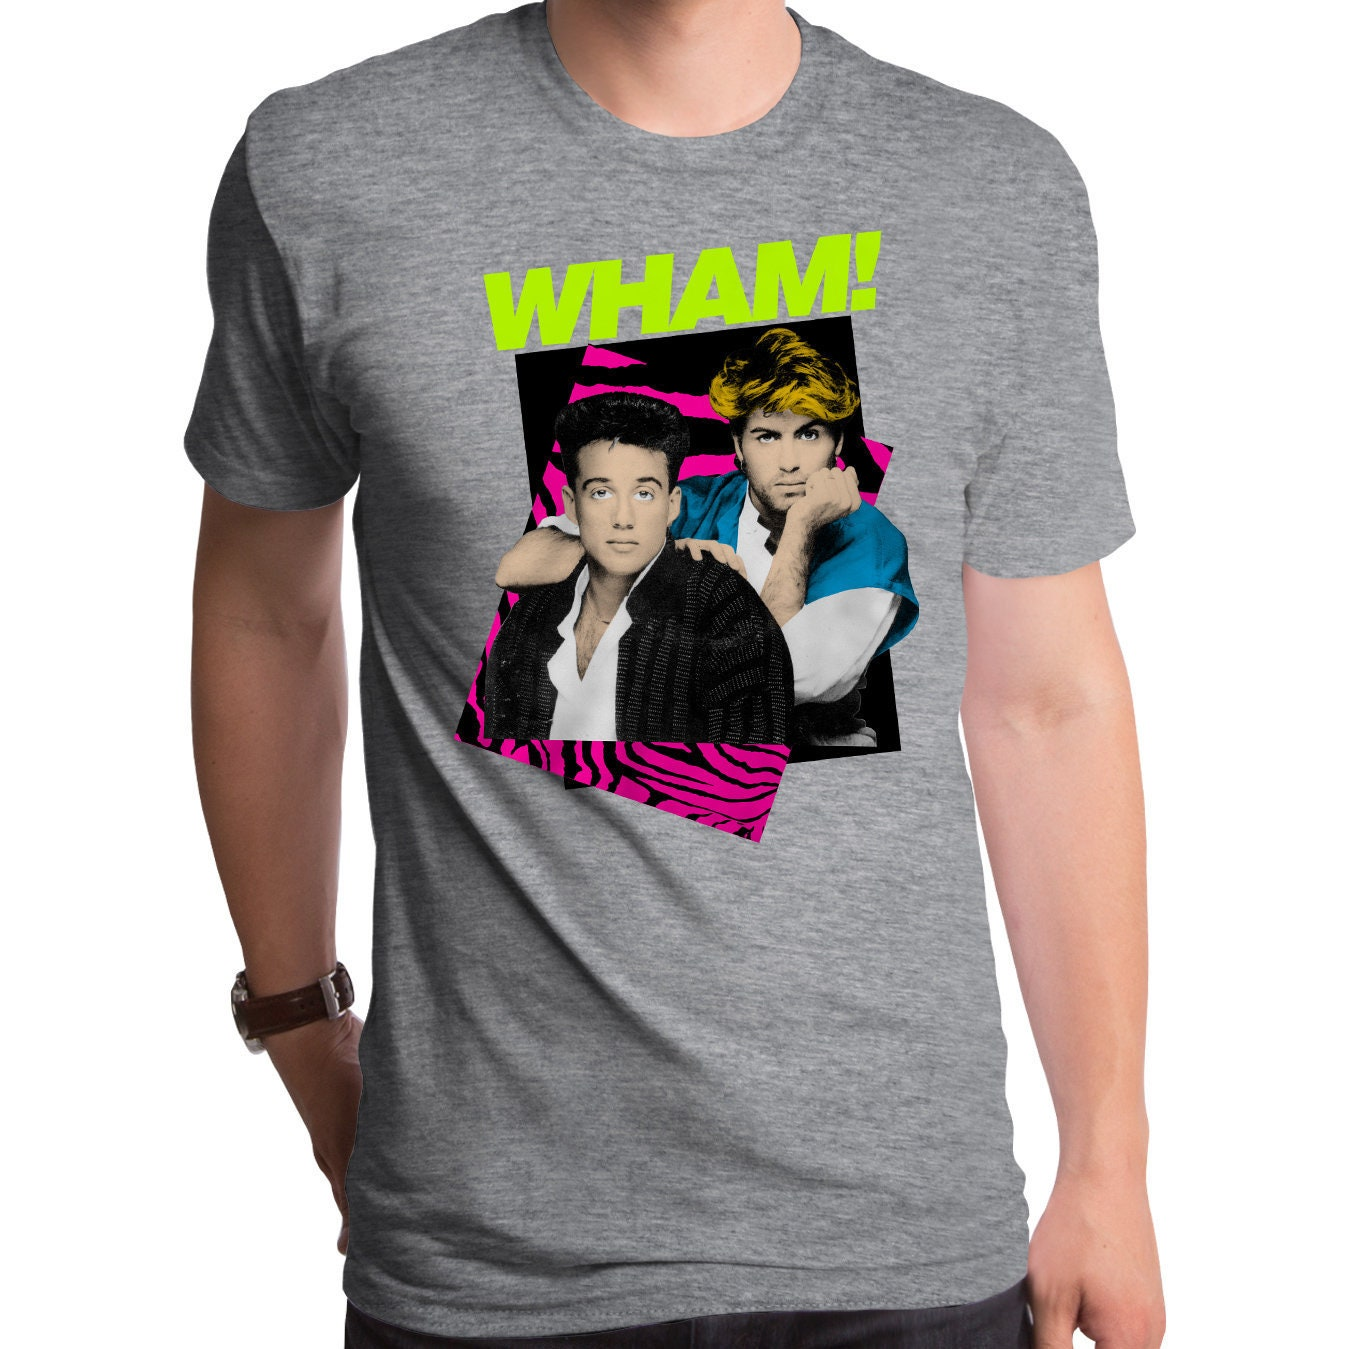 80s Tops, Shirts, T-shirts, Blouse   90s T-shirts Wham Careless Whisper Mens T-Shirt  Whm0029-101Dhg Music, English Pop, London, 1980s, George Michael, Andrew Ridgeley, Concert $13.97 AT vintagedancer.com